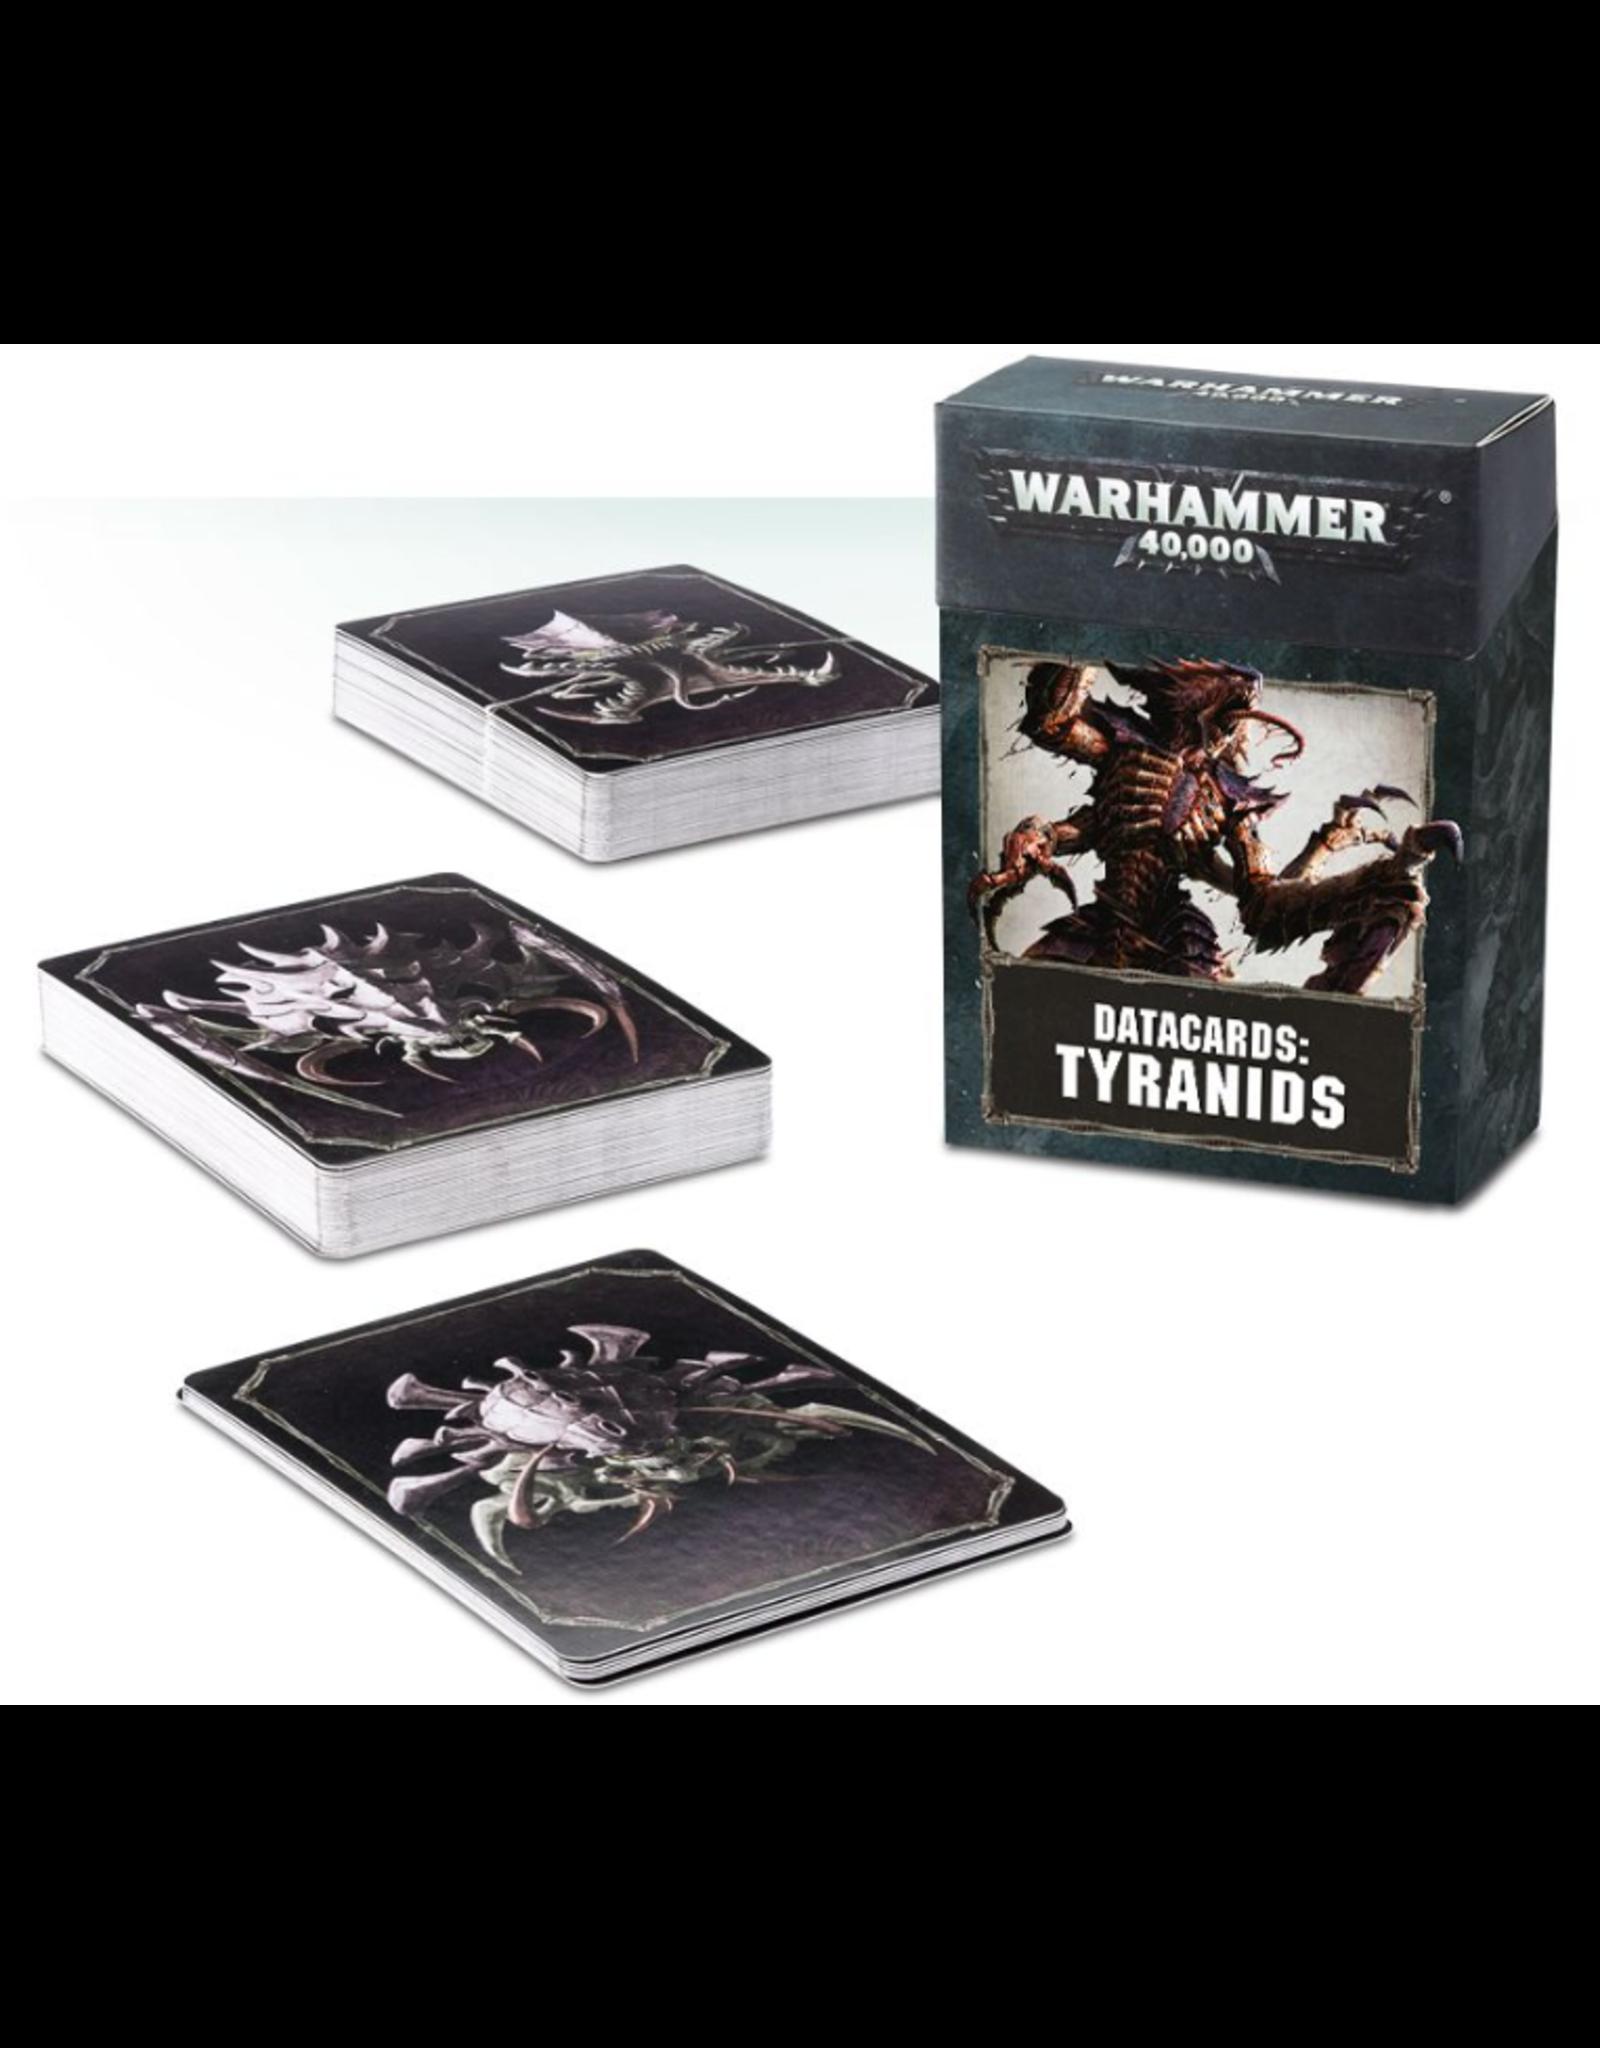 Warhammer 40K Datacards Tyranids